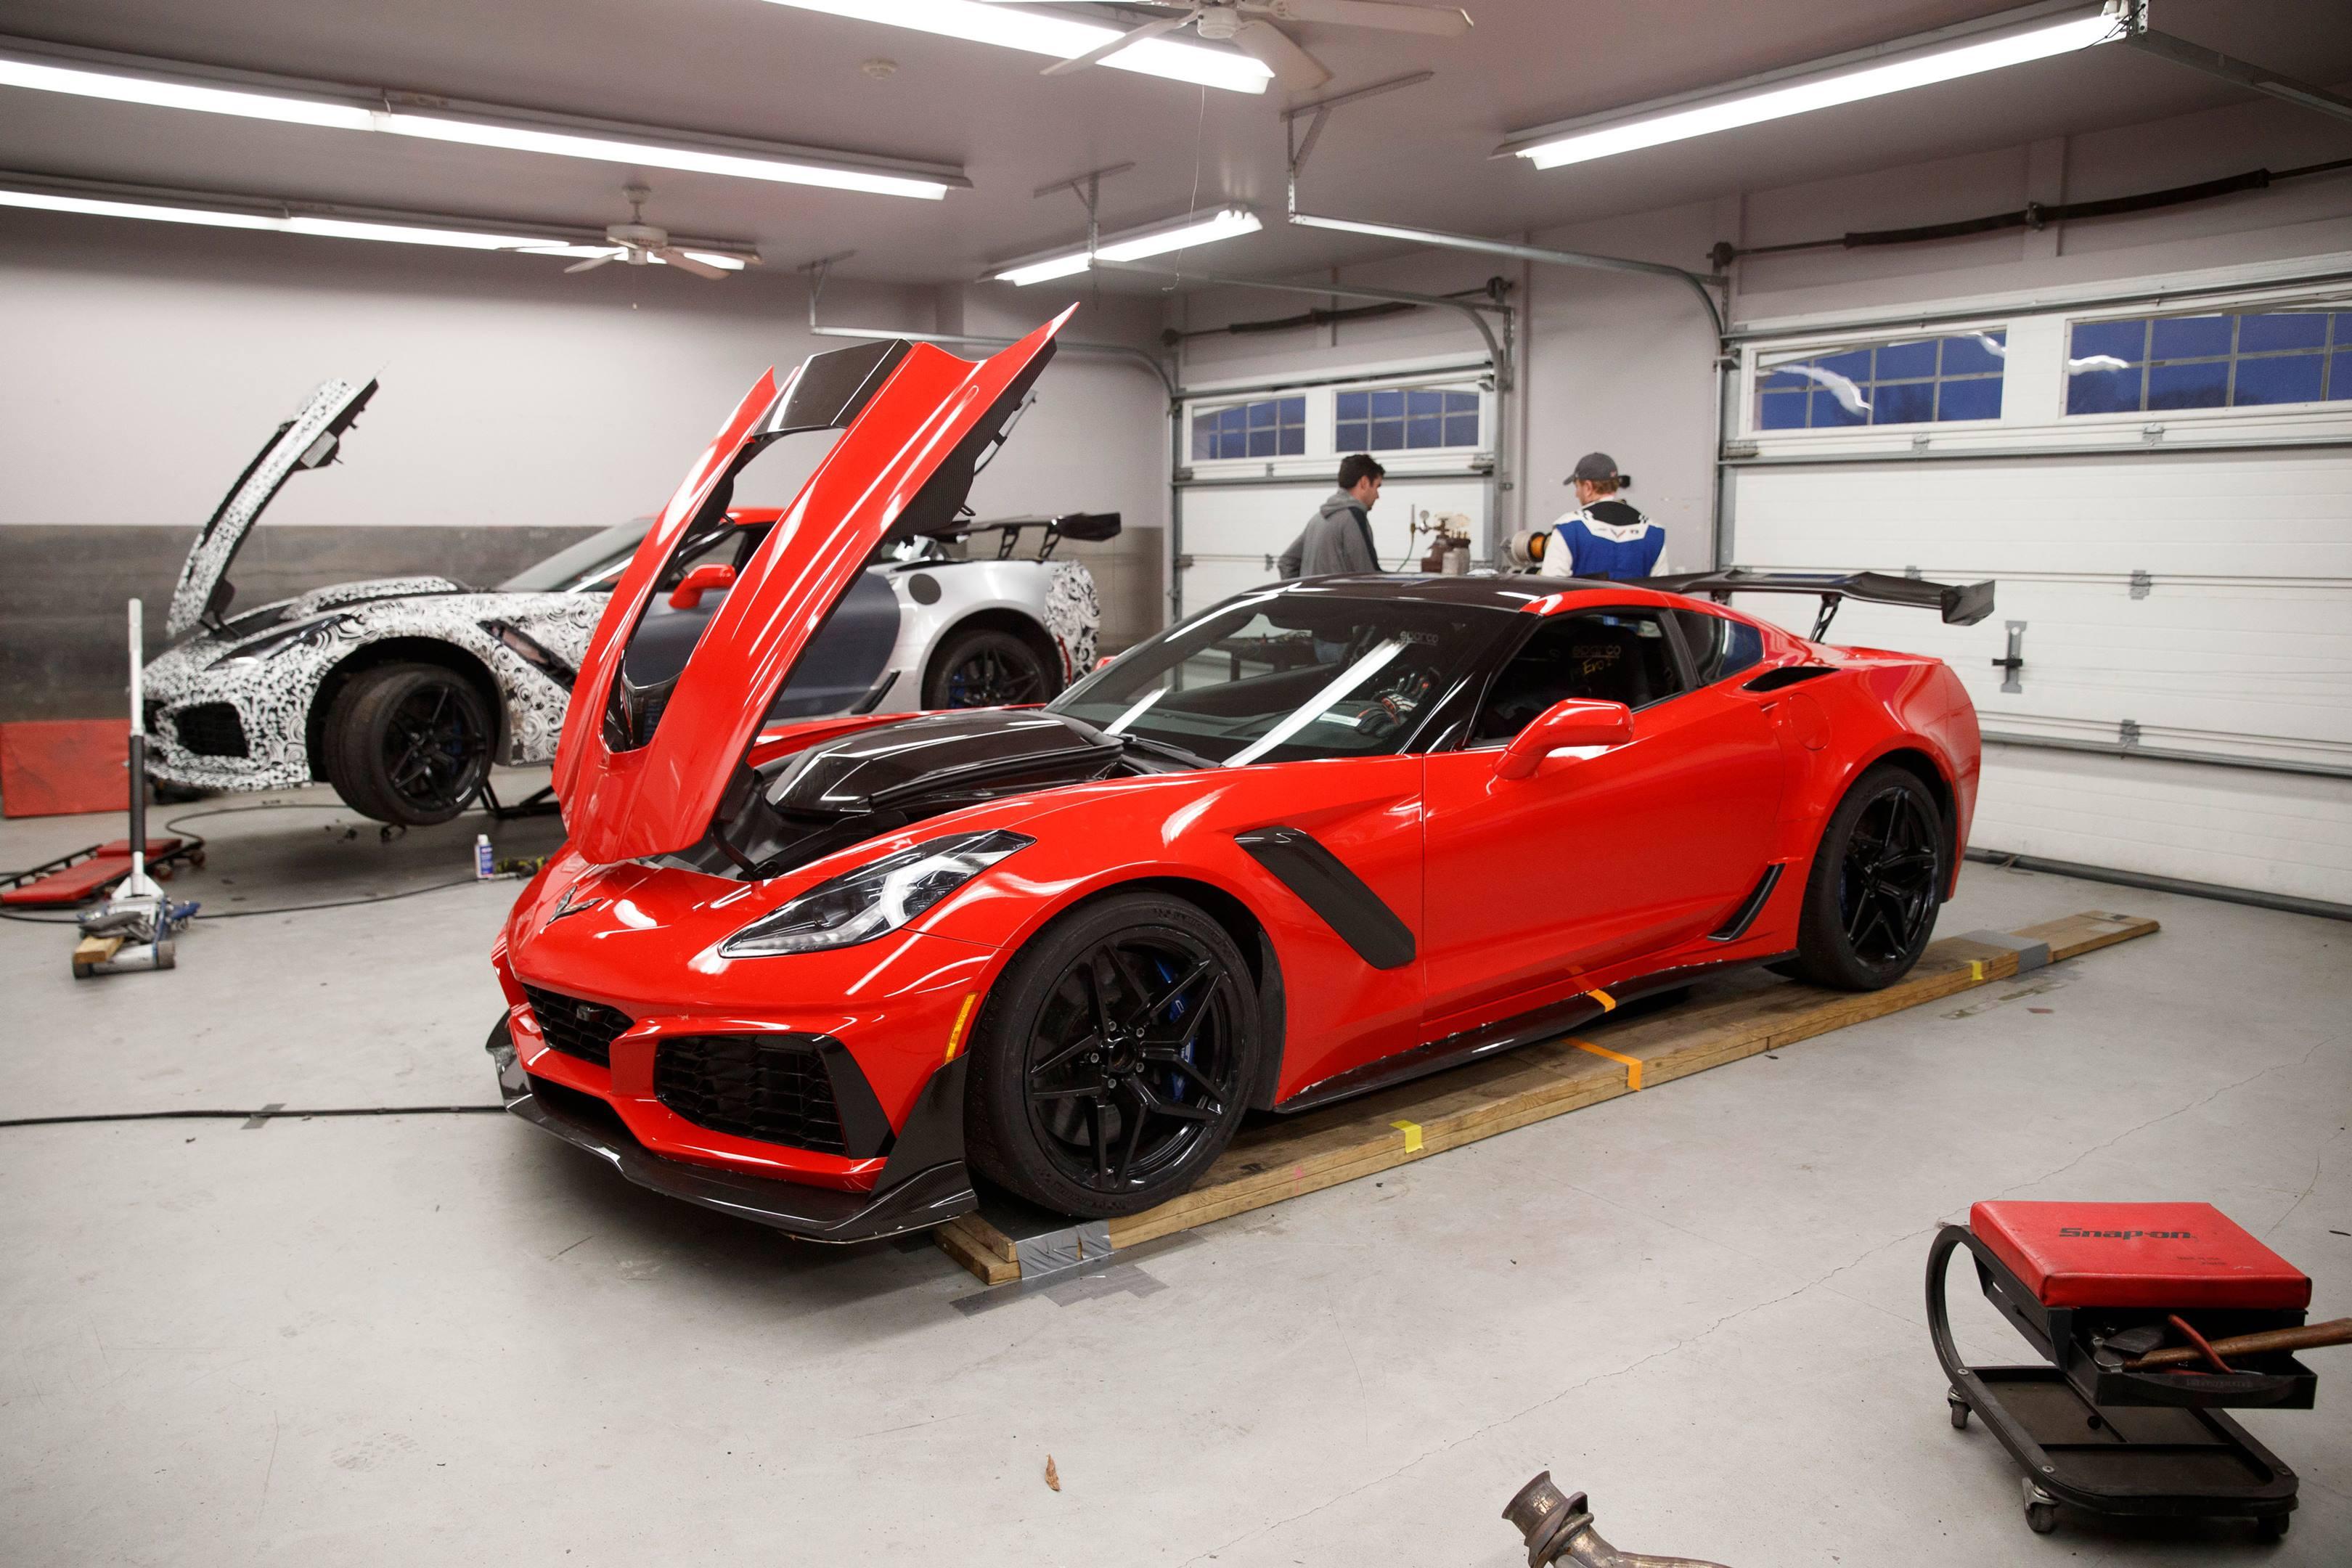 2019 Chevrolet Corvette ZR1 in the garage